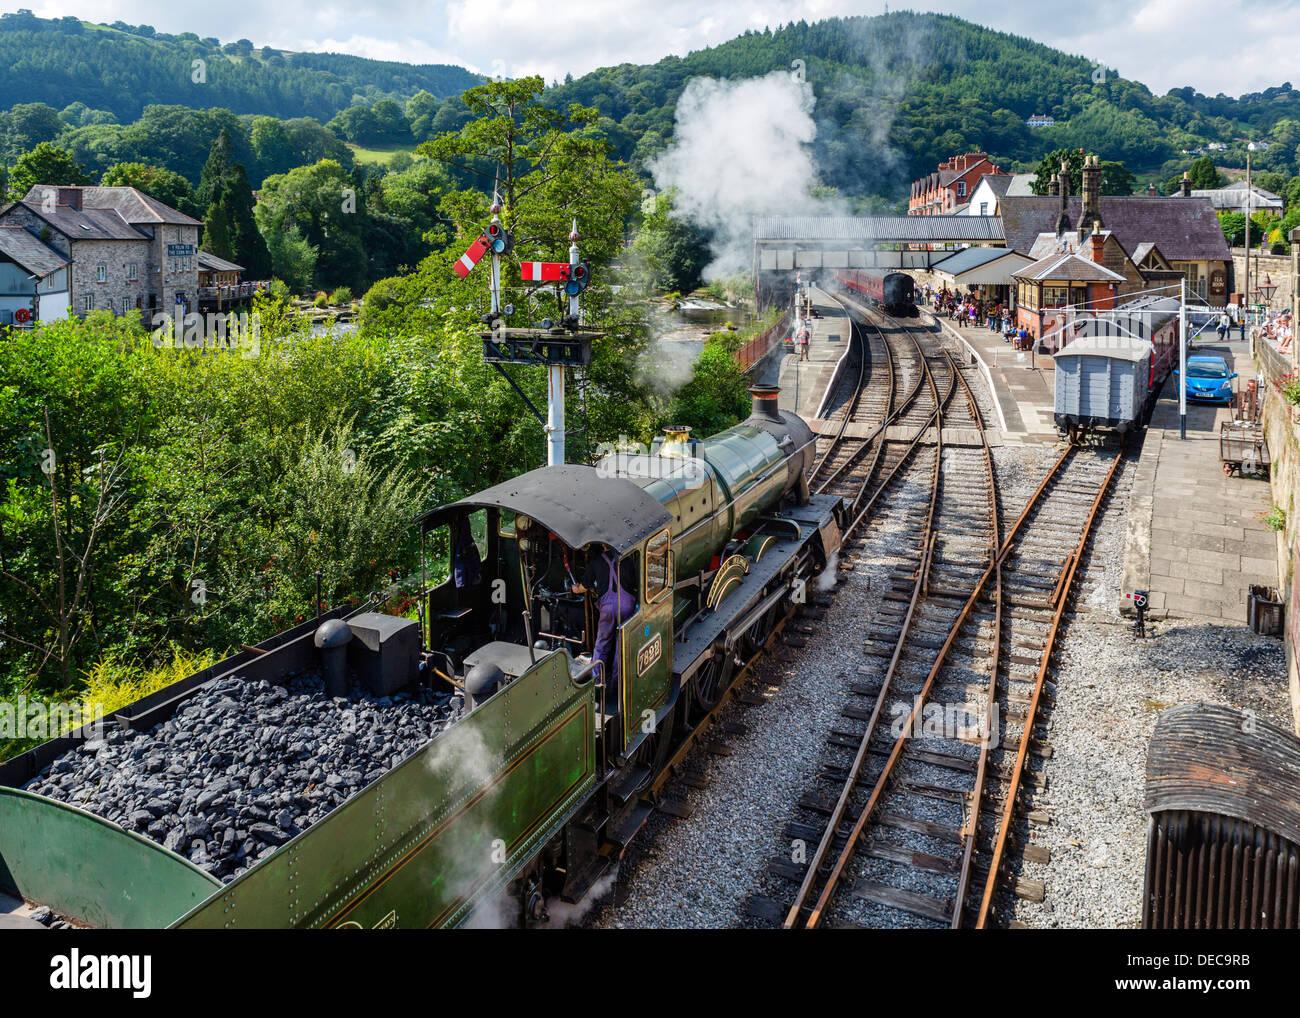 Il motore 7822 'Foxcote Manor' locomotiva a vapore a Llangollen Railway Station, Llangollen, Denbighshire, Wales, Regno Unito Immagini Stock